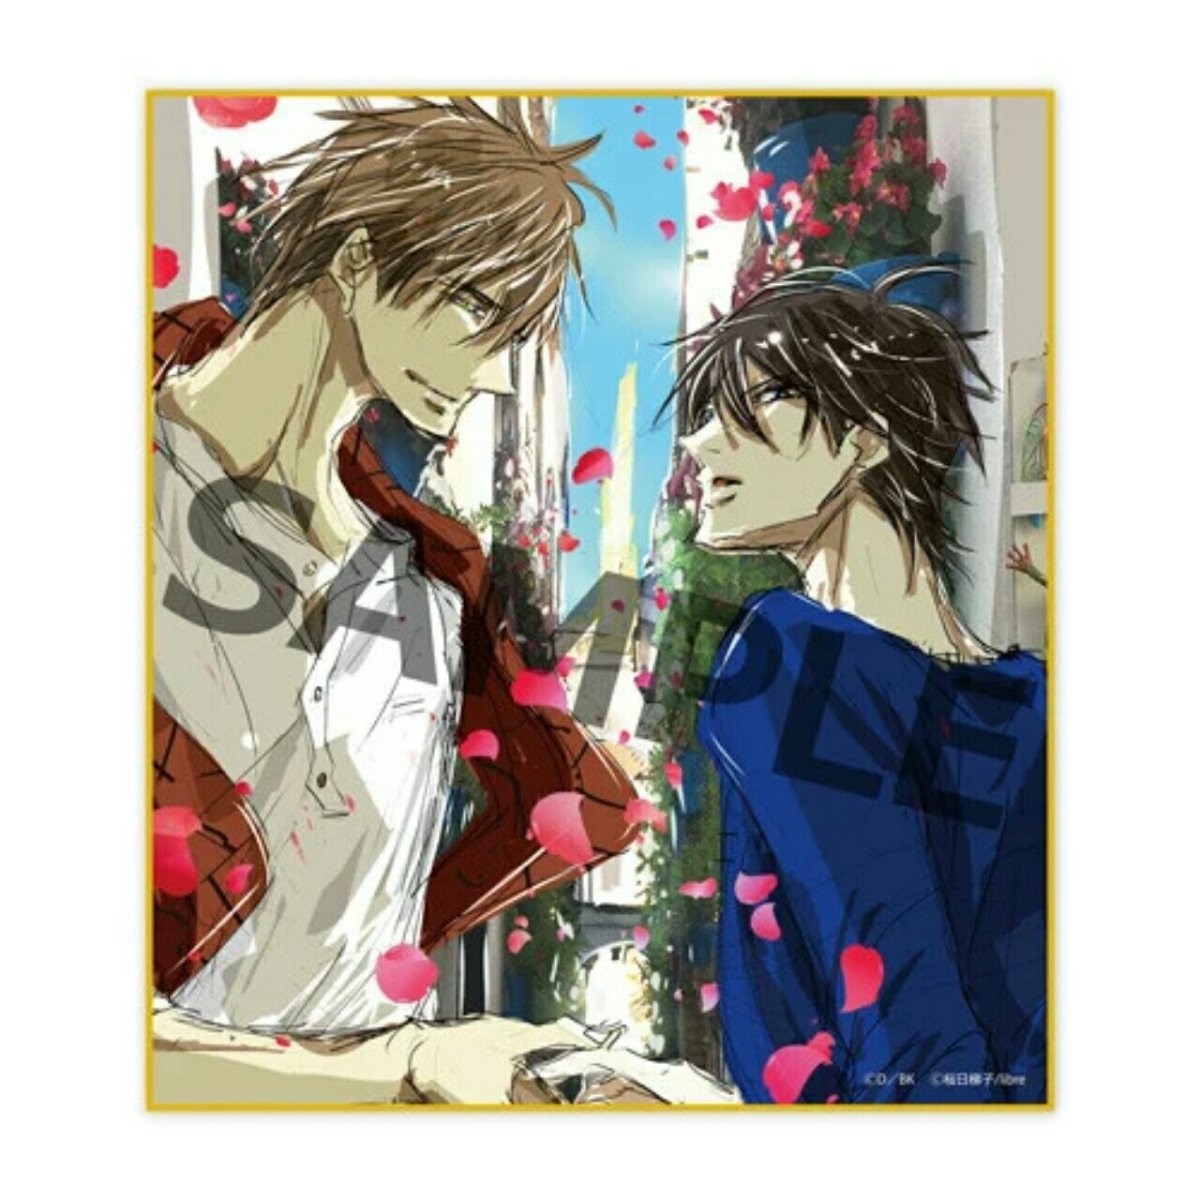 Arc Spain dari Manga BL DAKAICHI Mendapatkan Film Anime untuk Musim Gugur Tahun Ini 3